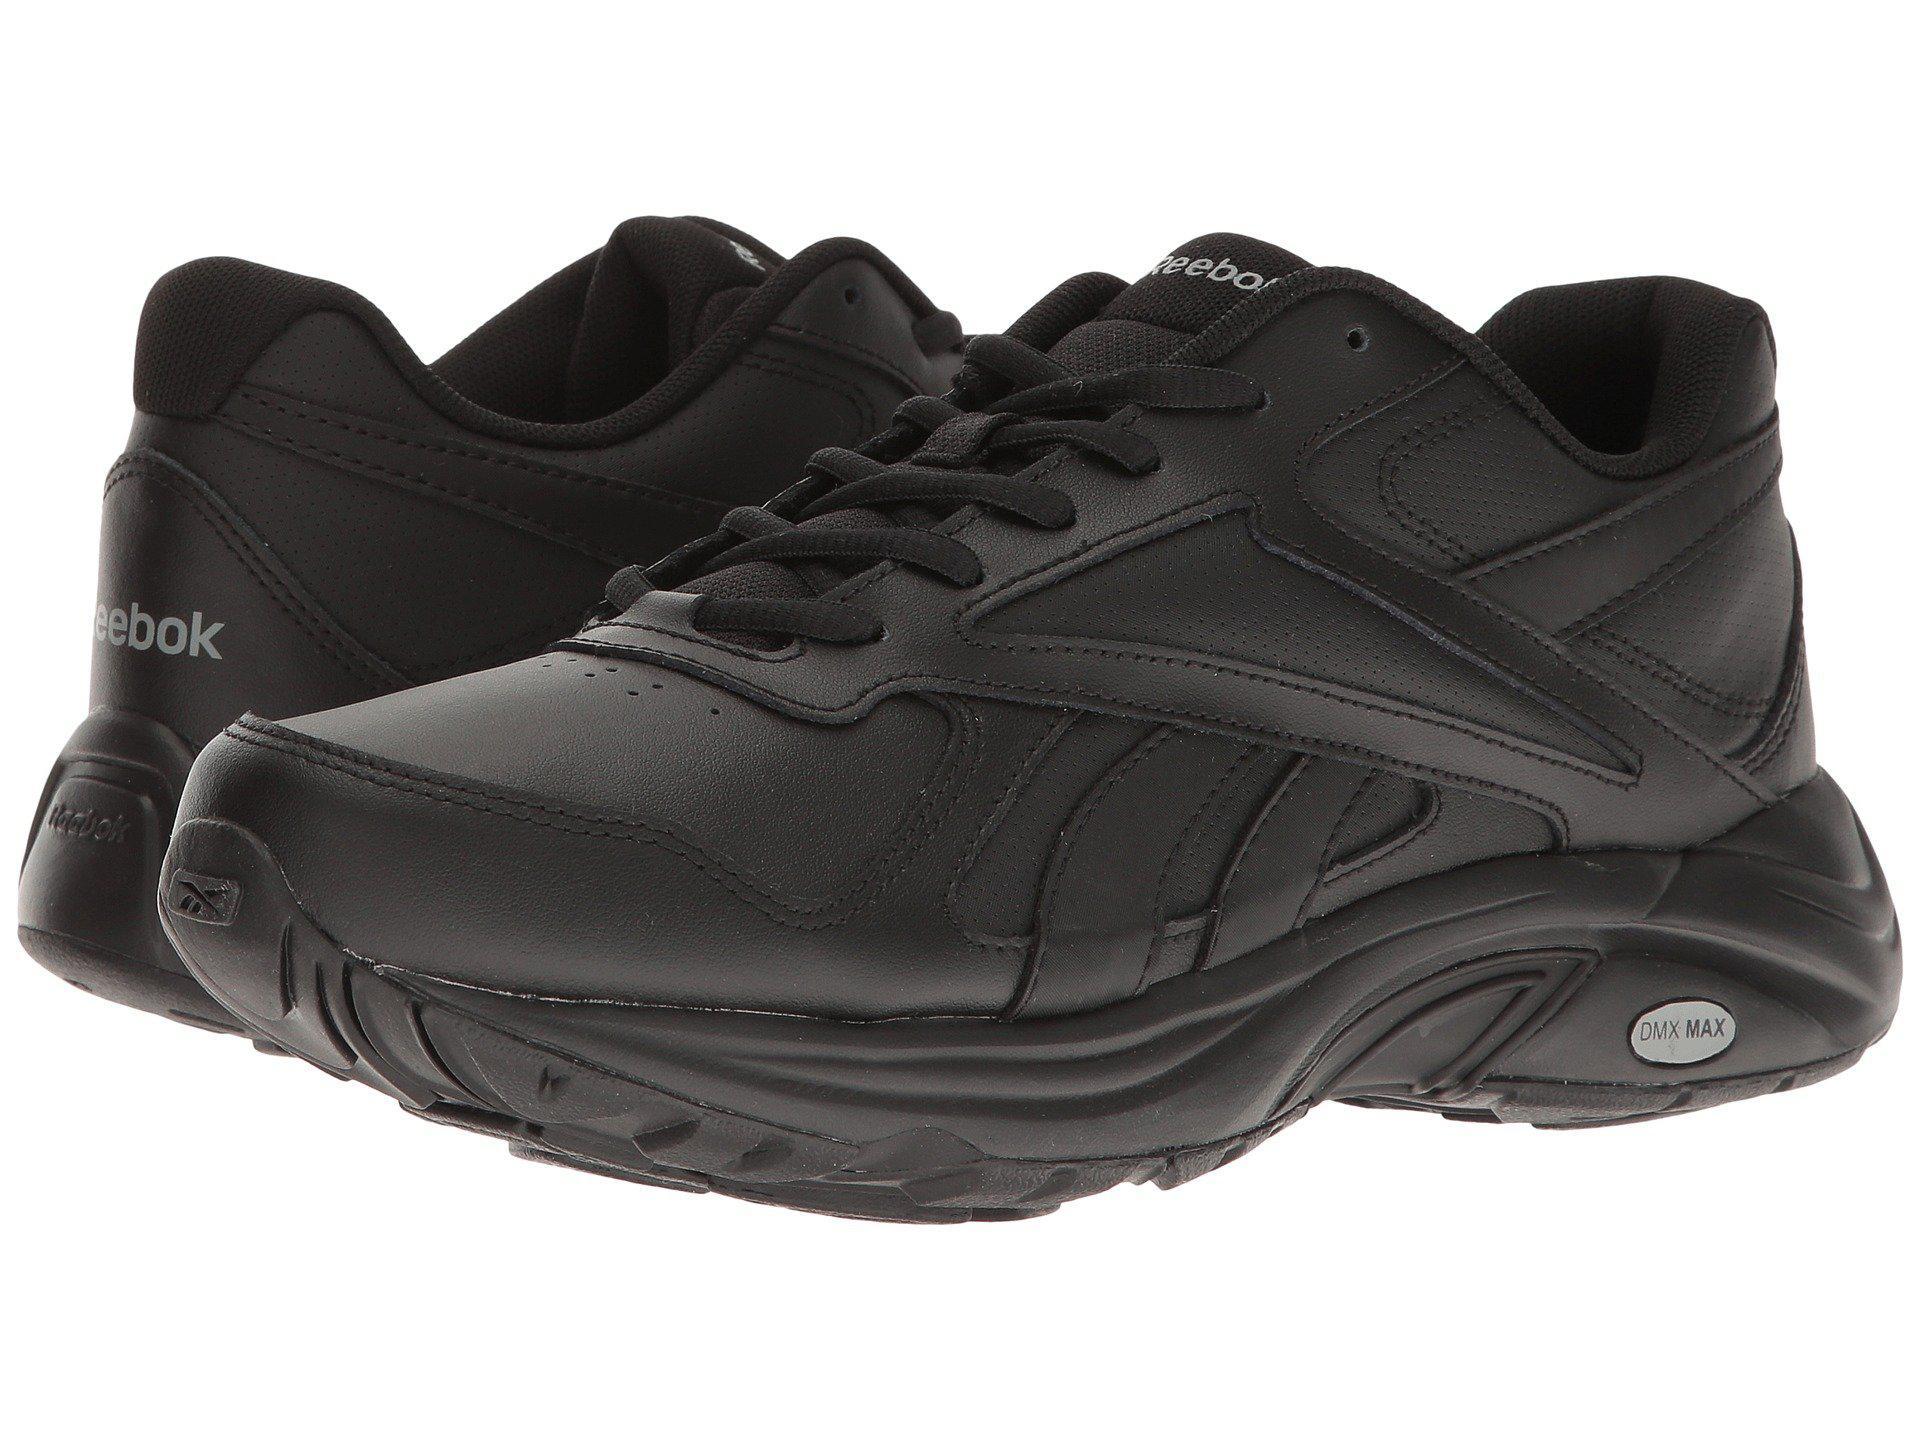 cb59ee6a2ff3 Lyst - Reebok Walk Ultra V Dmx Max in Black for Men